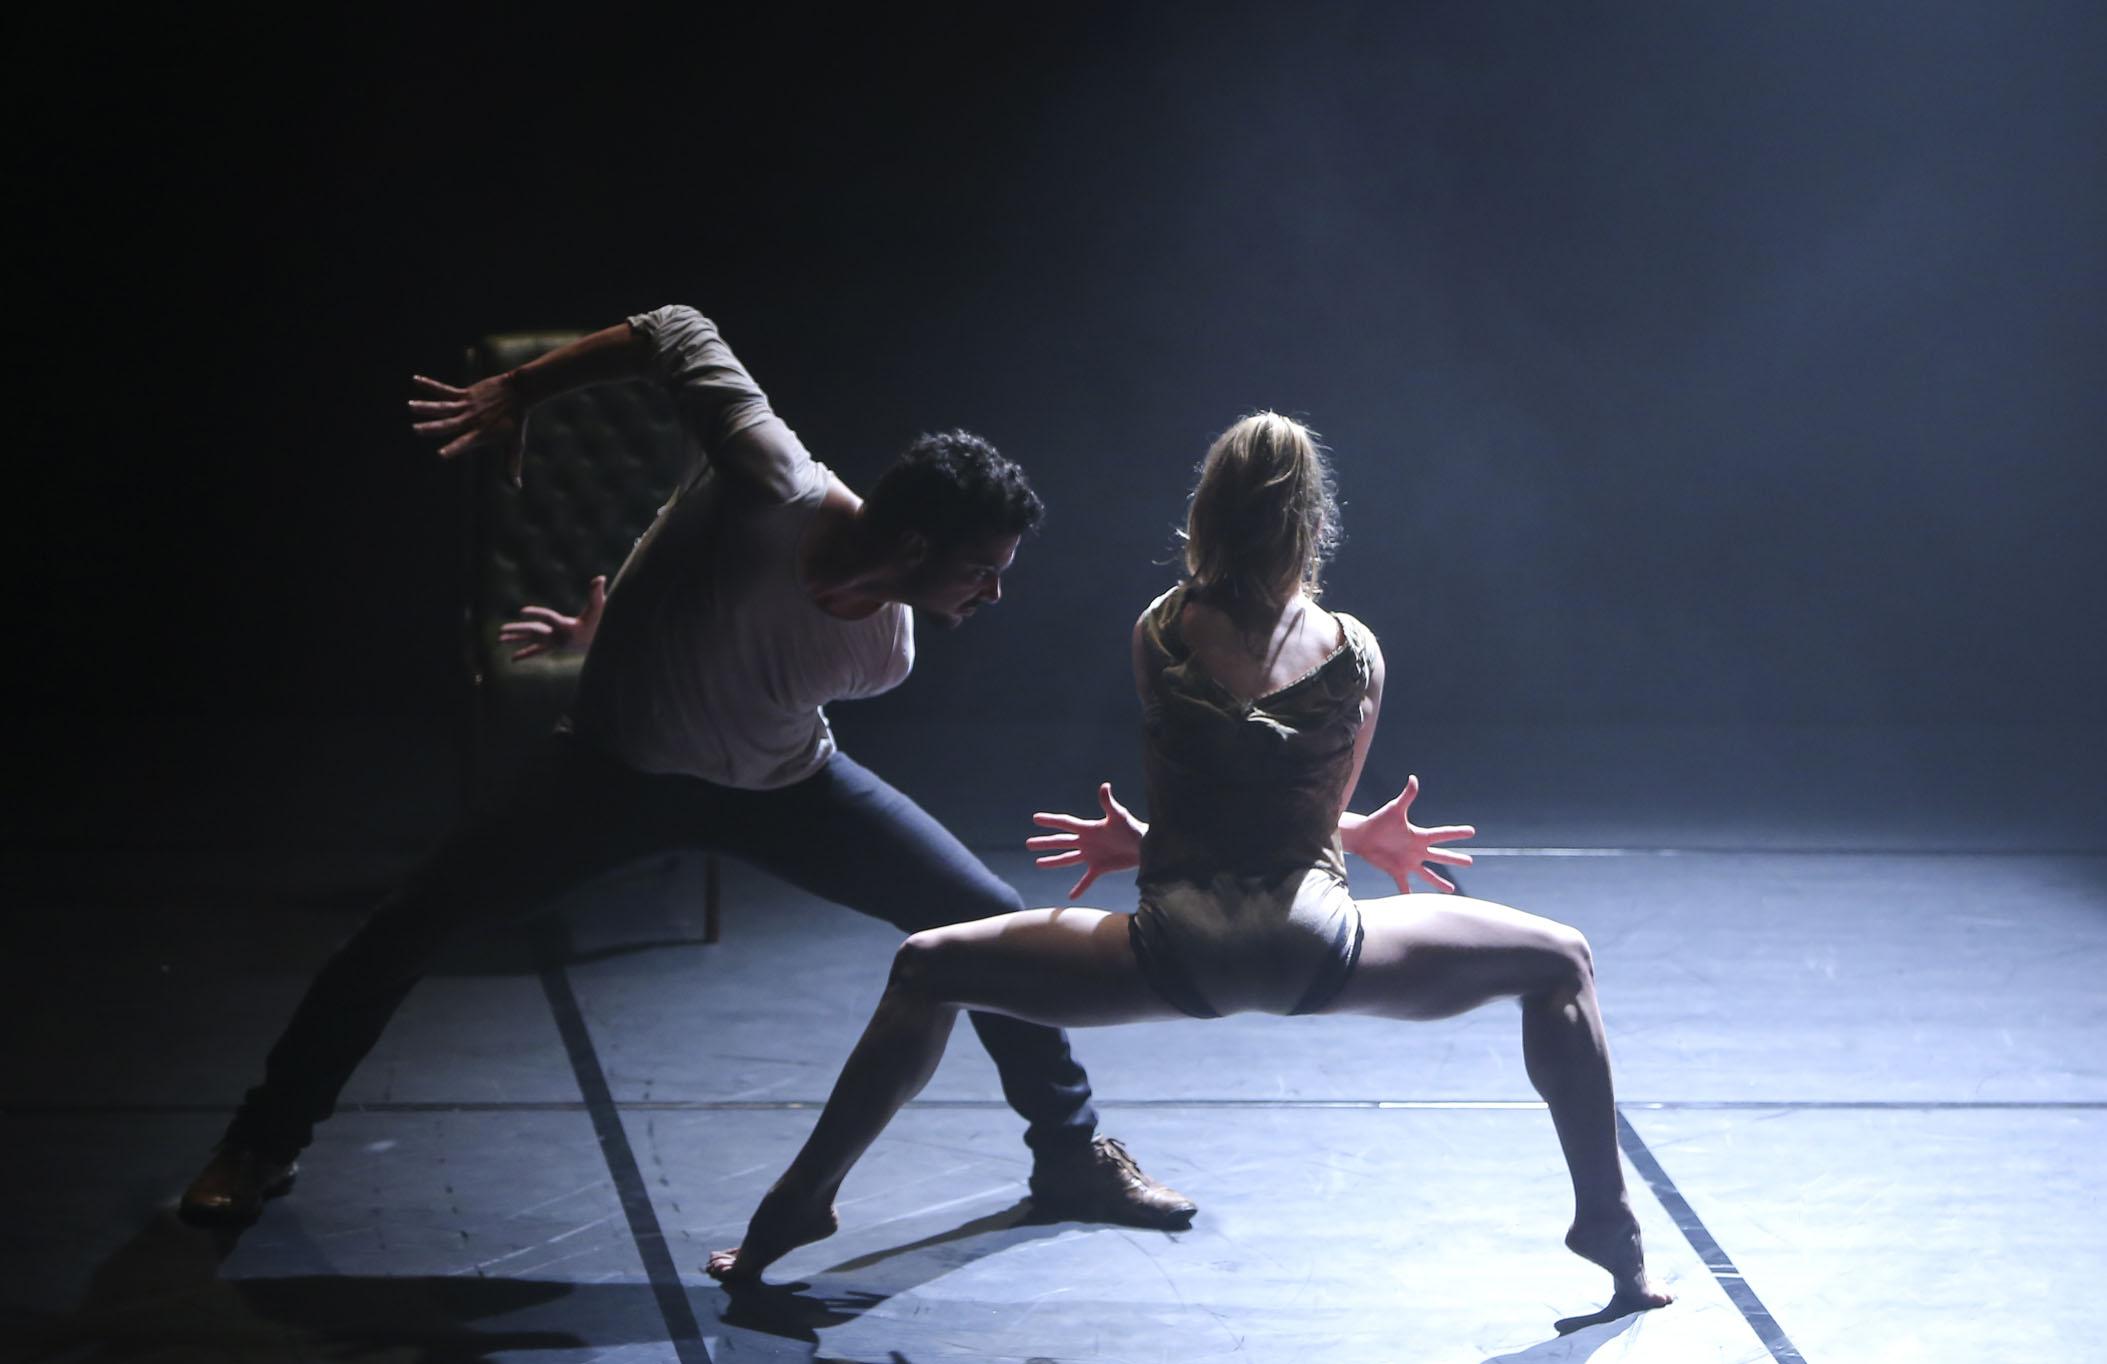 Maria Kong dancers in Open Source ©Ascaf